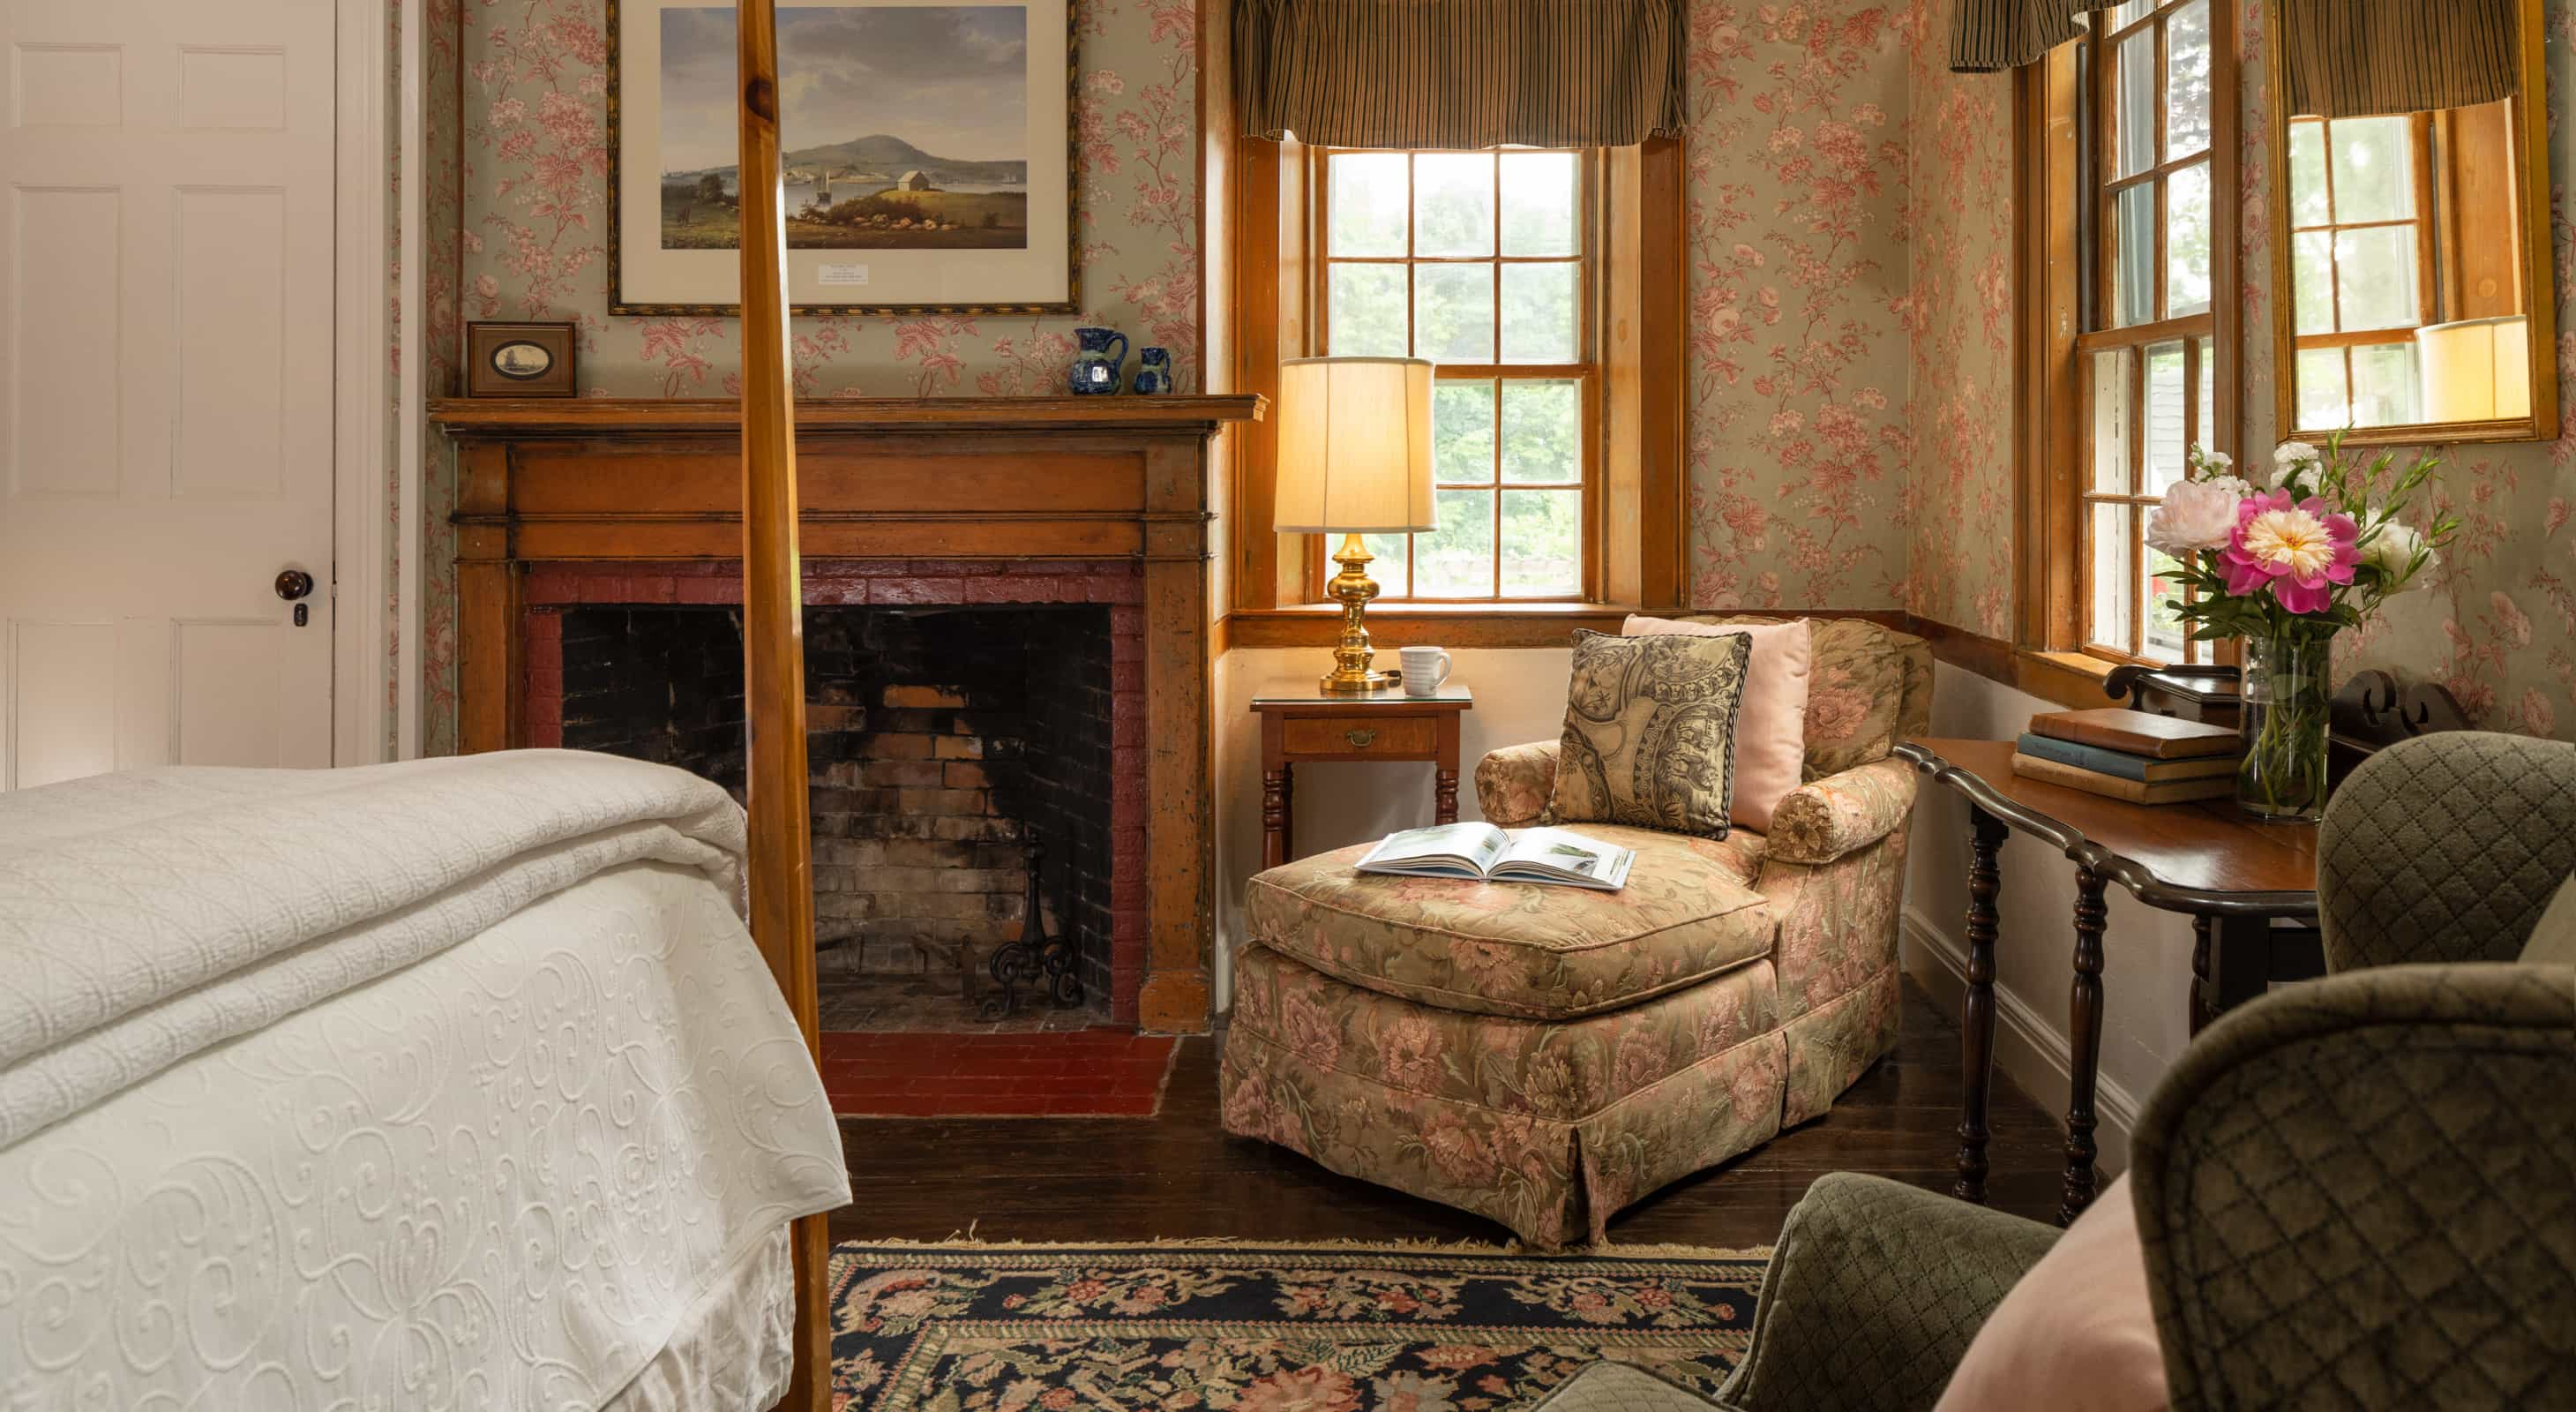 Room 11, a Romantic Coastal Maine getaway